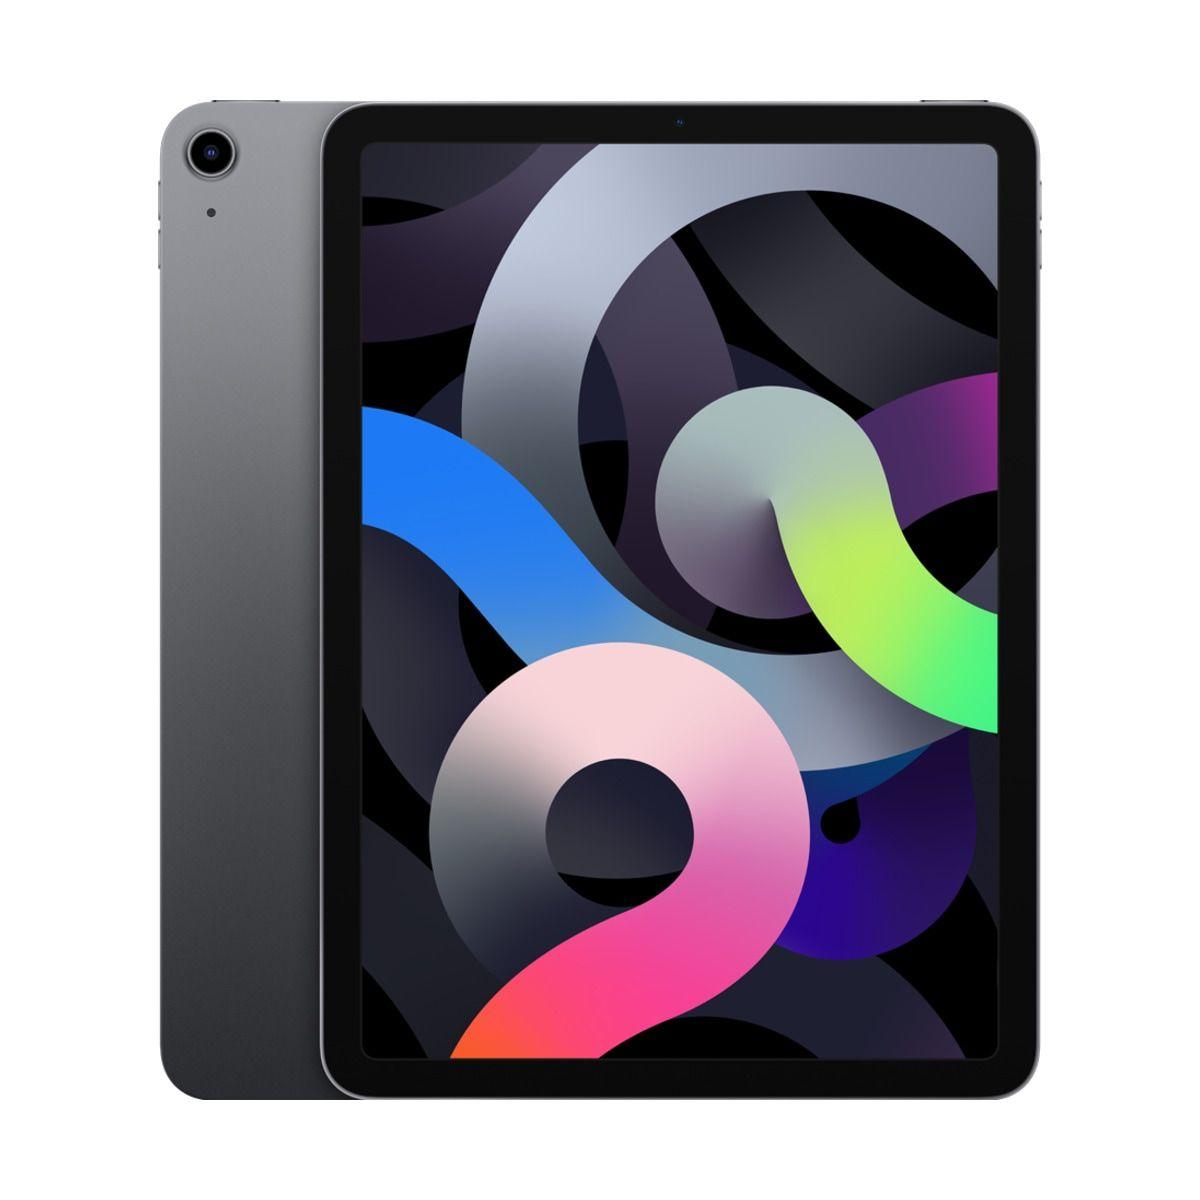 Apple iPad Air Wi-Fi 256GB - Space Grey / SK